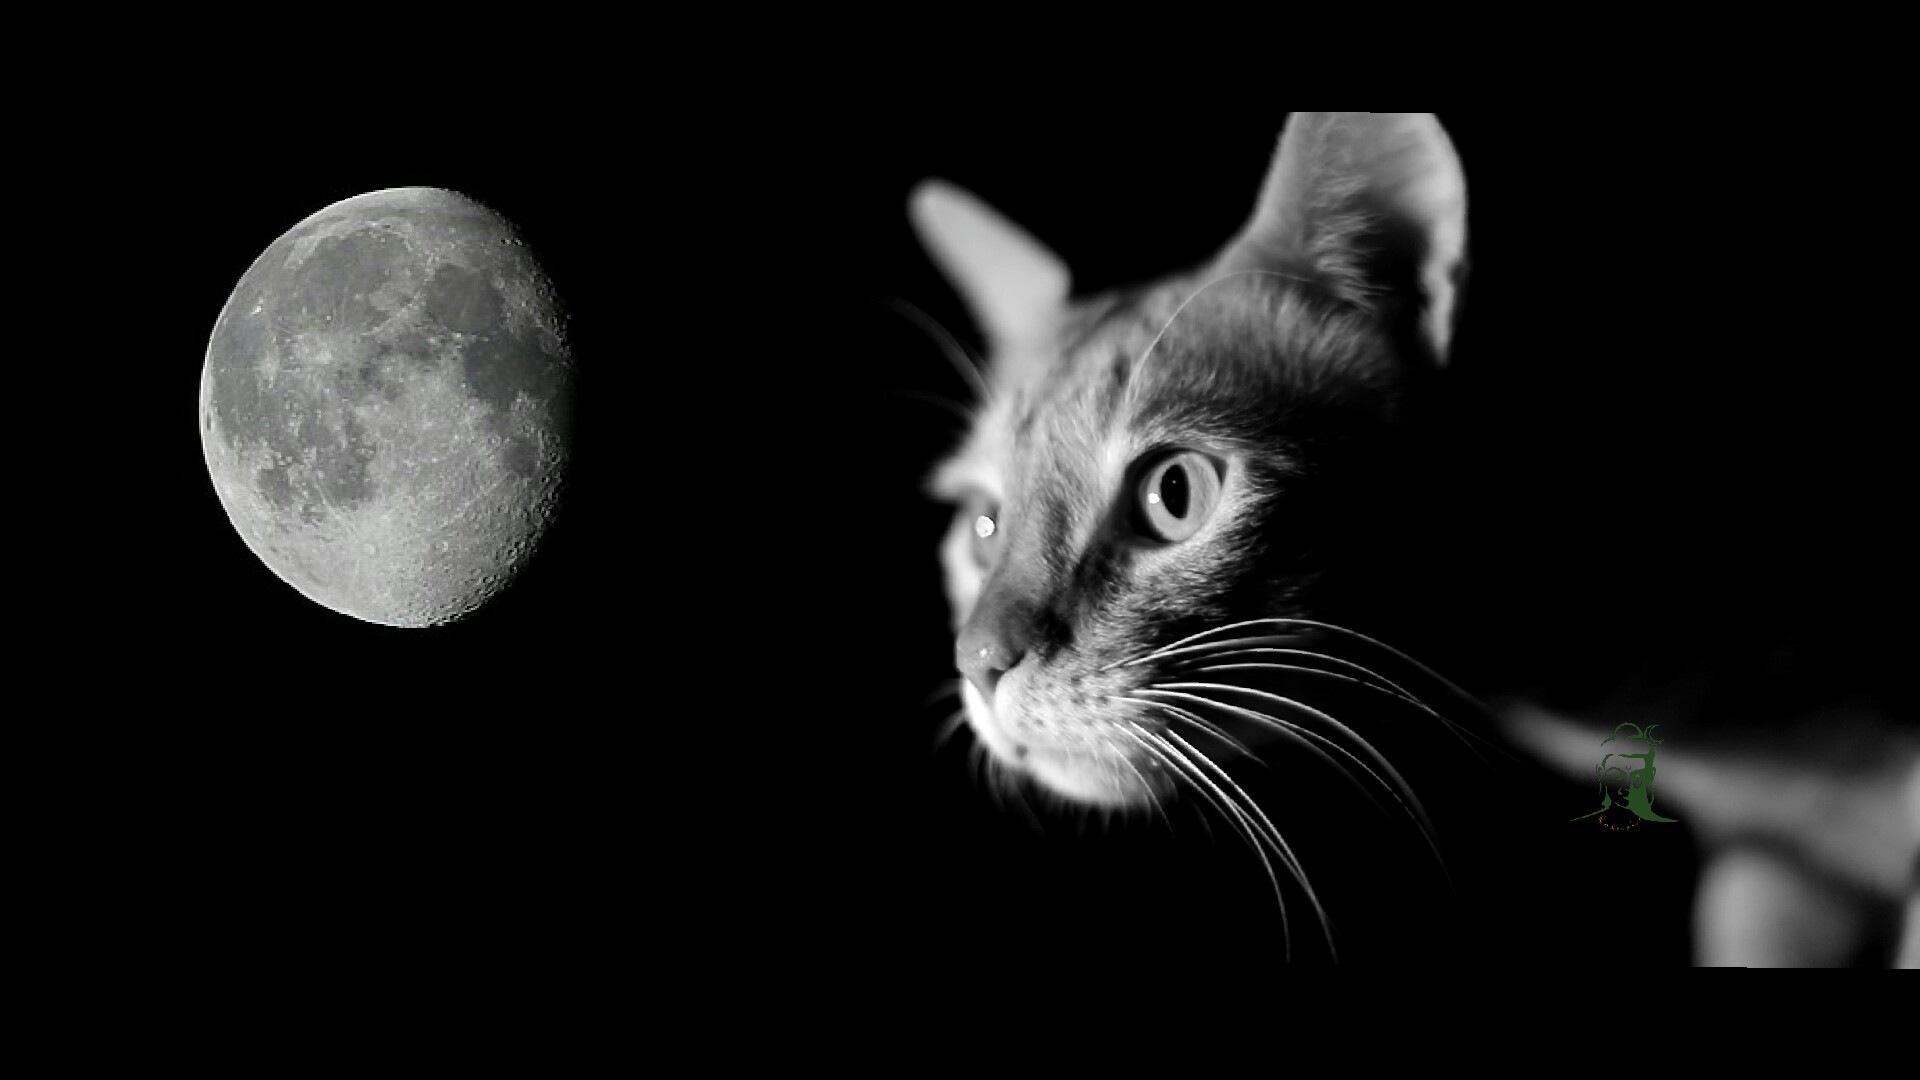 Moony cat by Shiv Bharadwaj